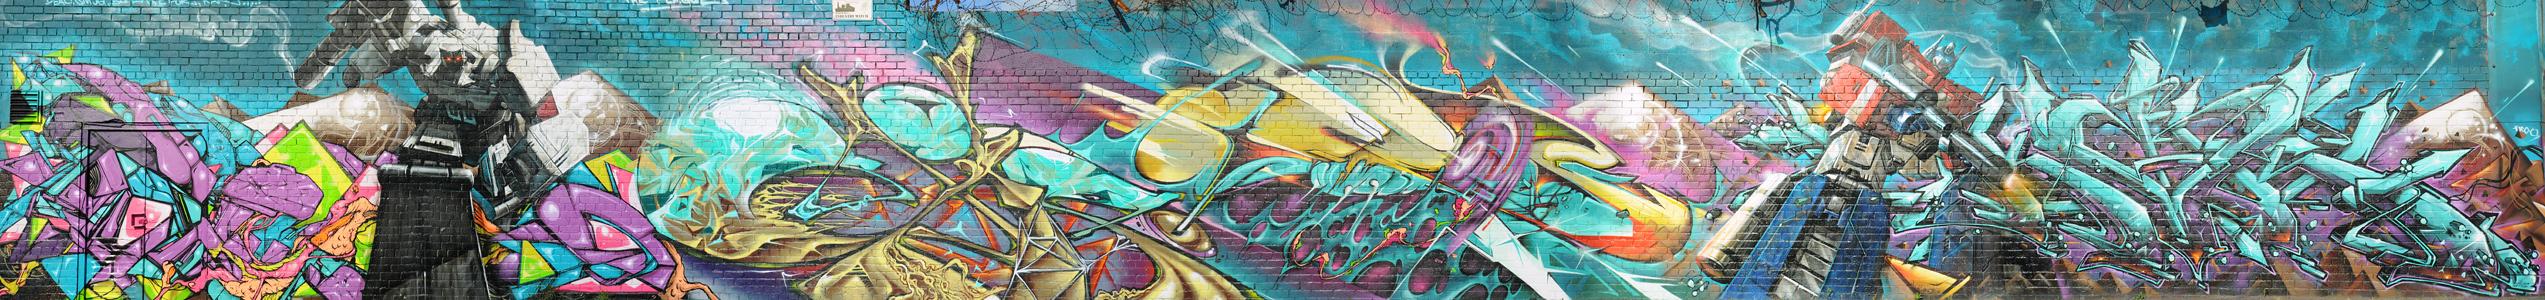 Transformers Graffiti by RyanMichael